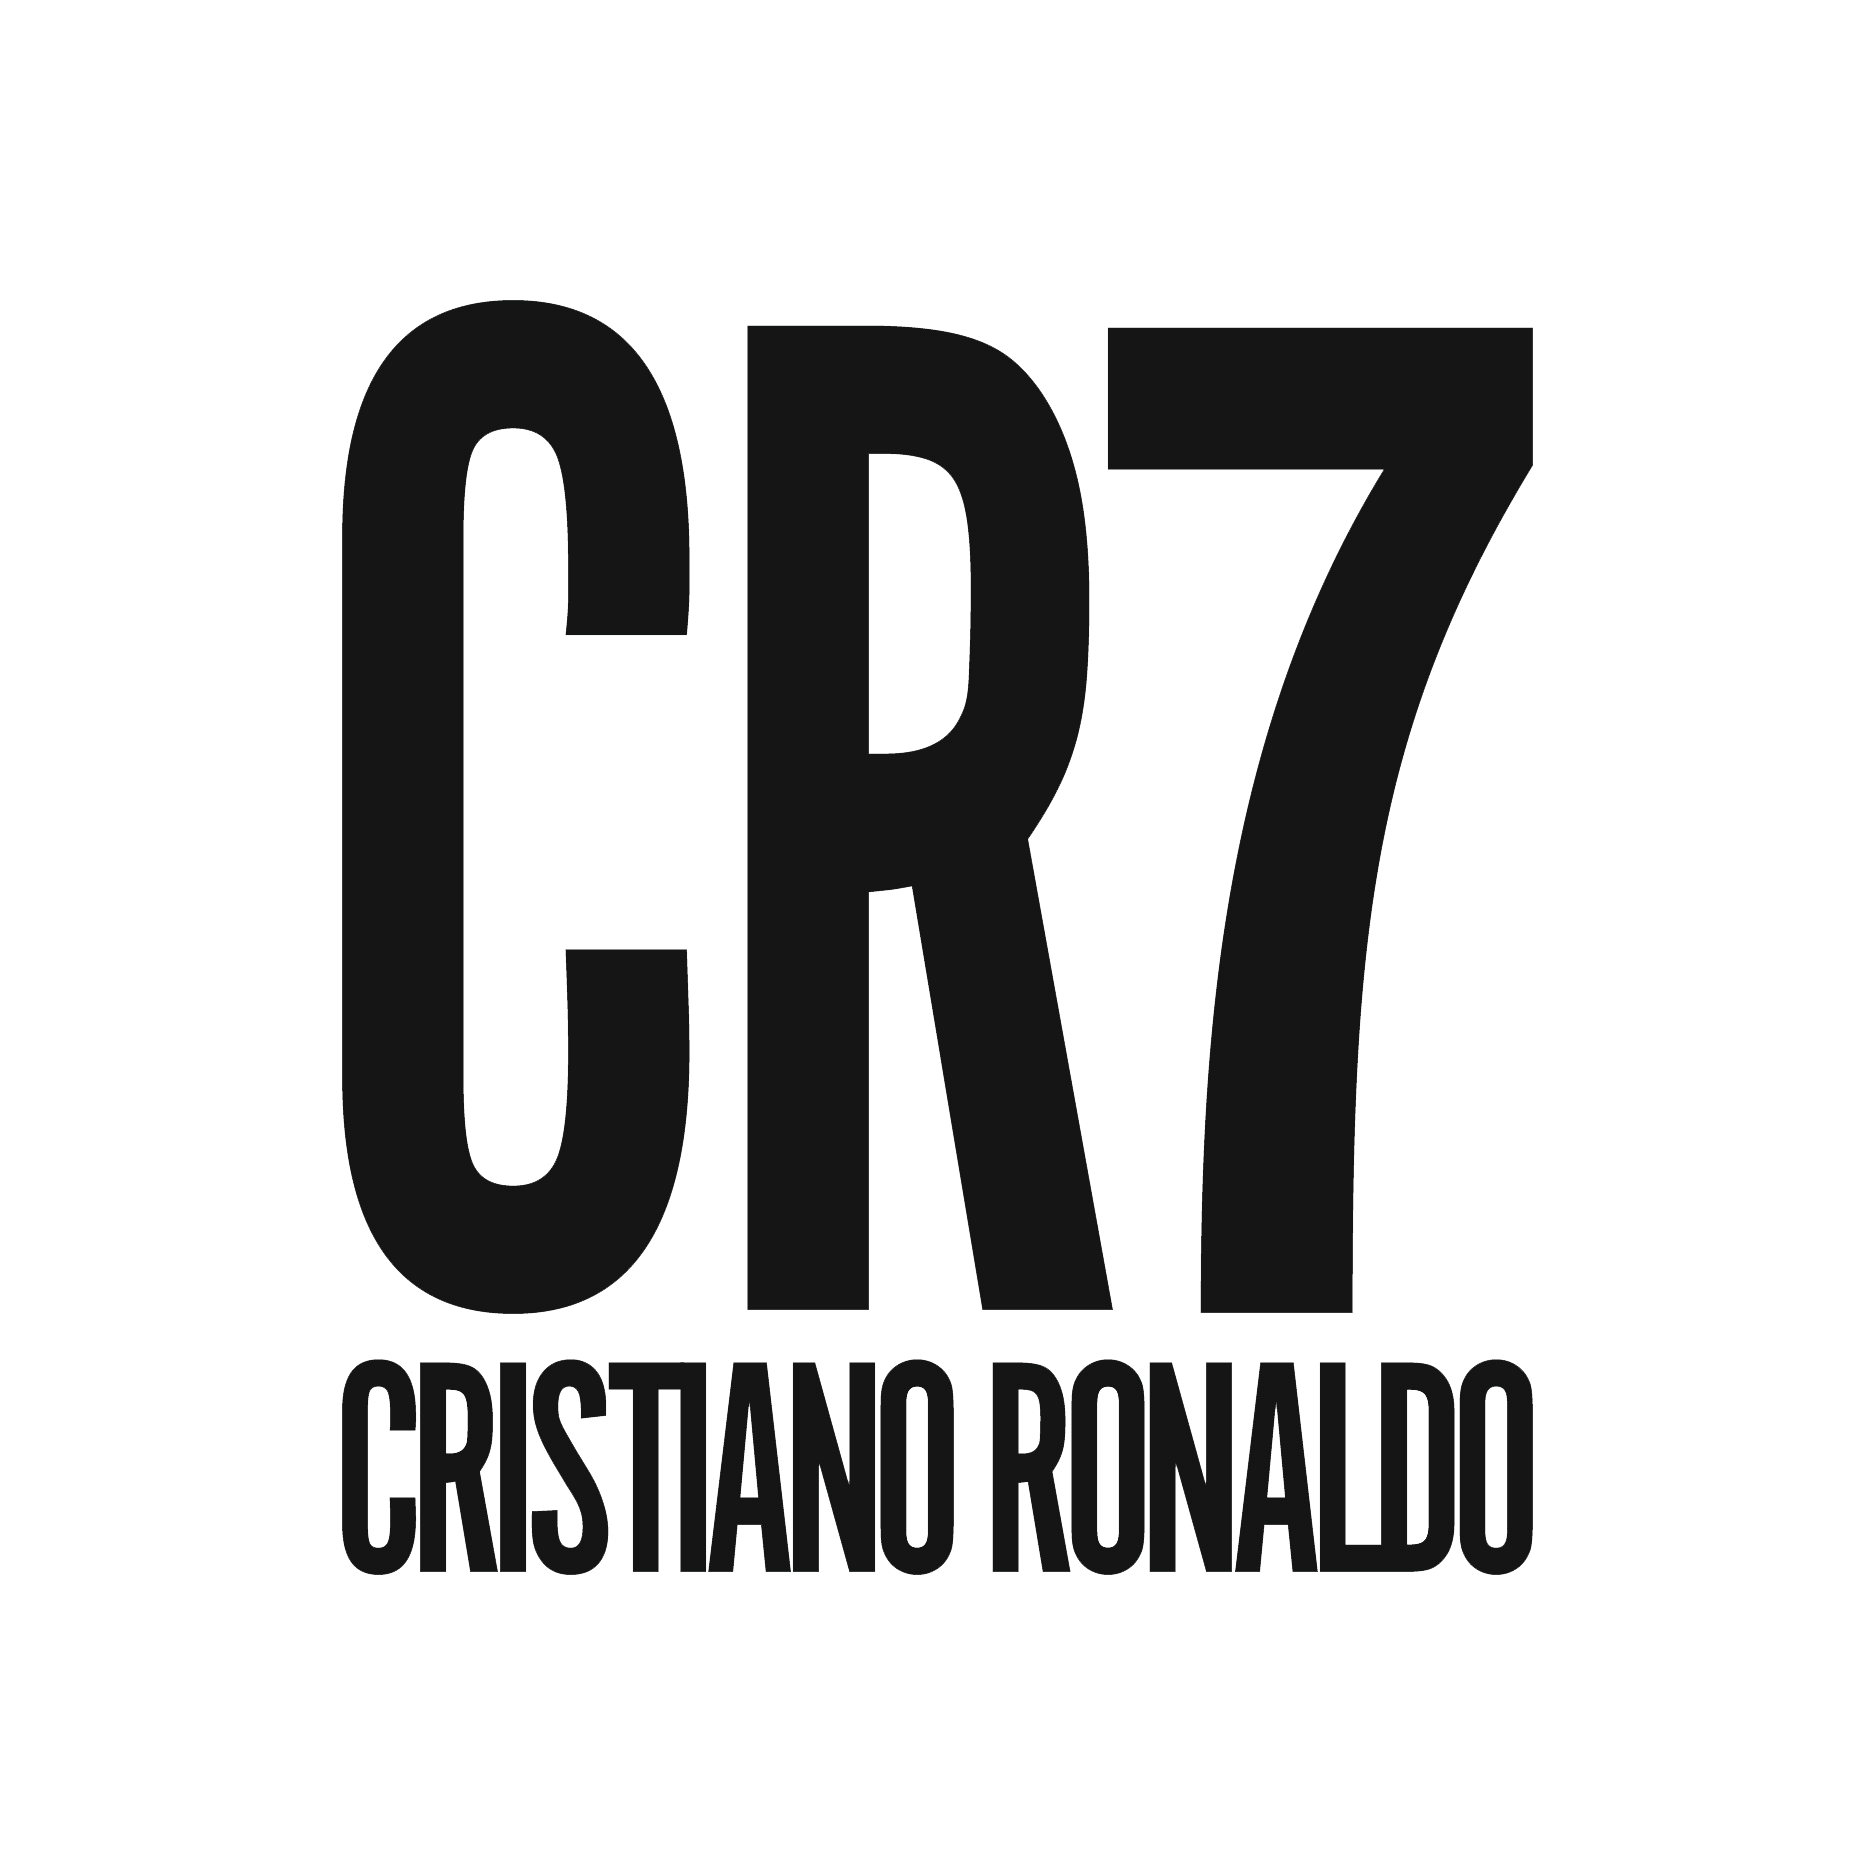 cr7 logo cristiano ronaldo png heart clipart black and white free heart clipart black and white outline